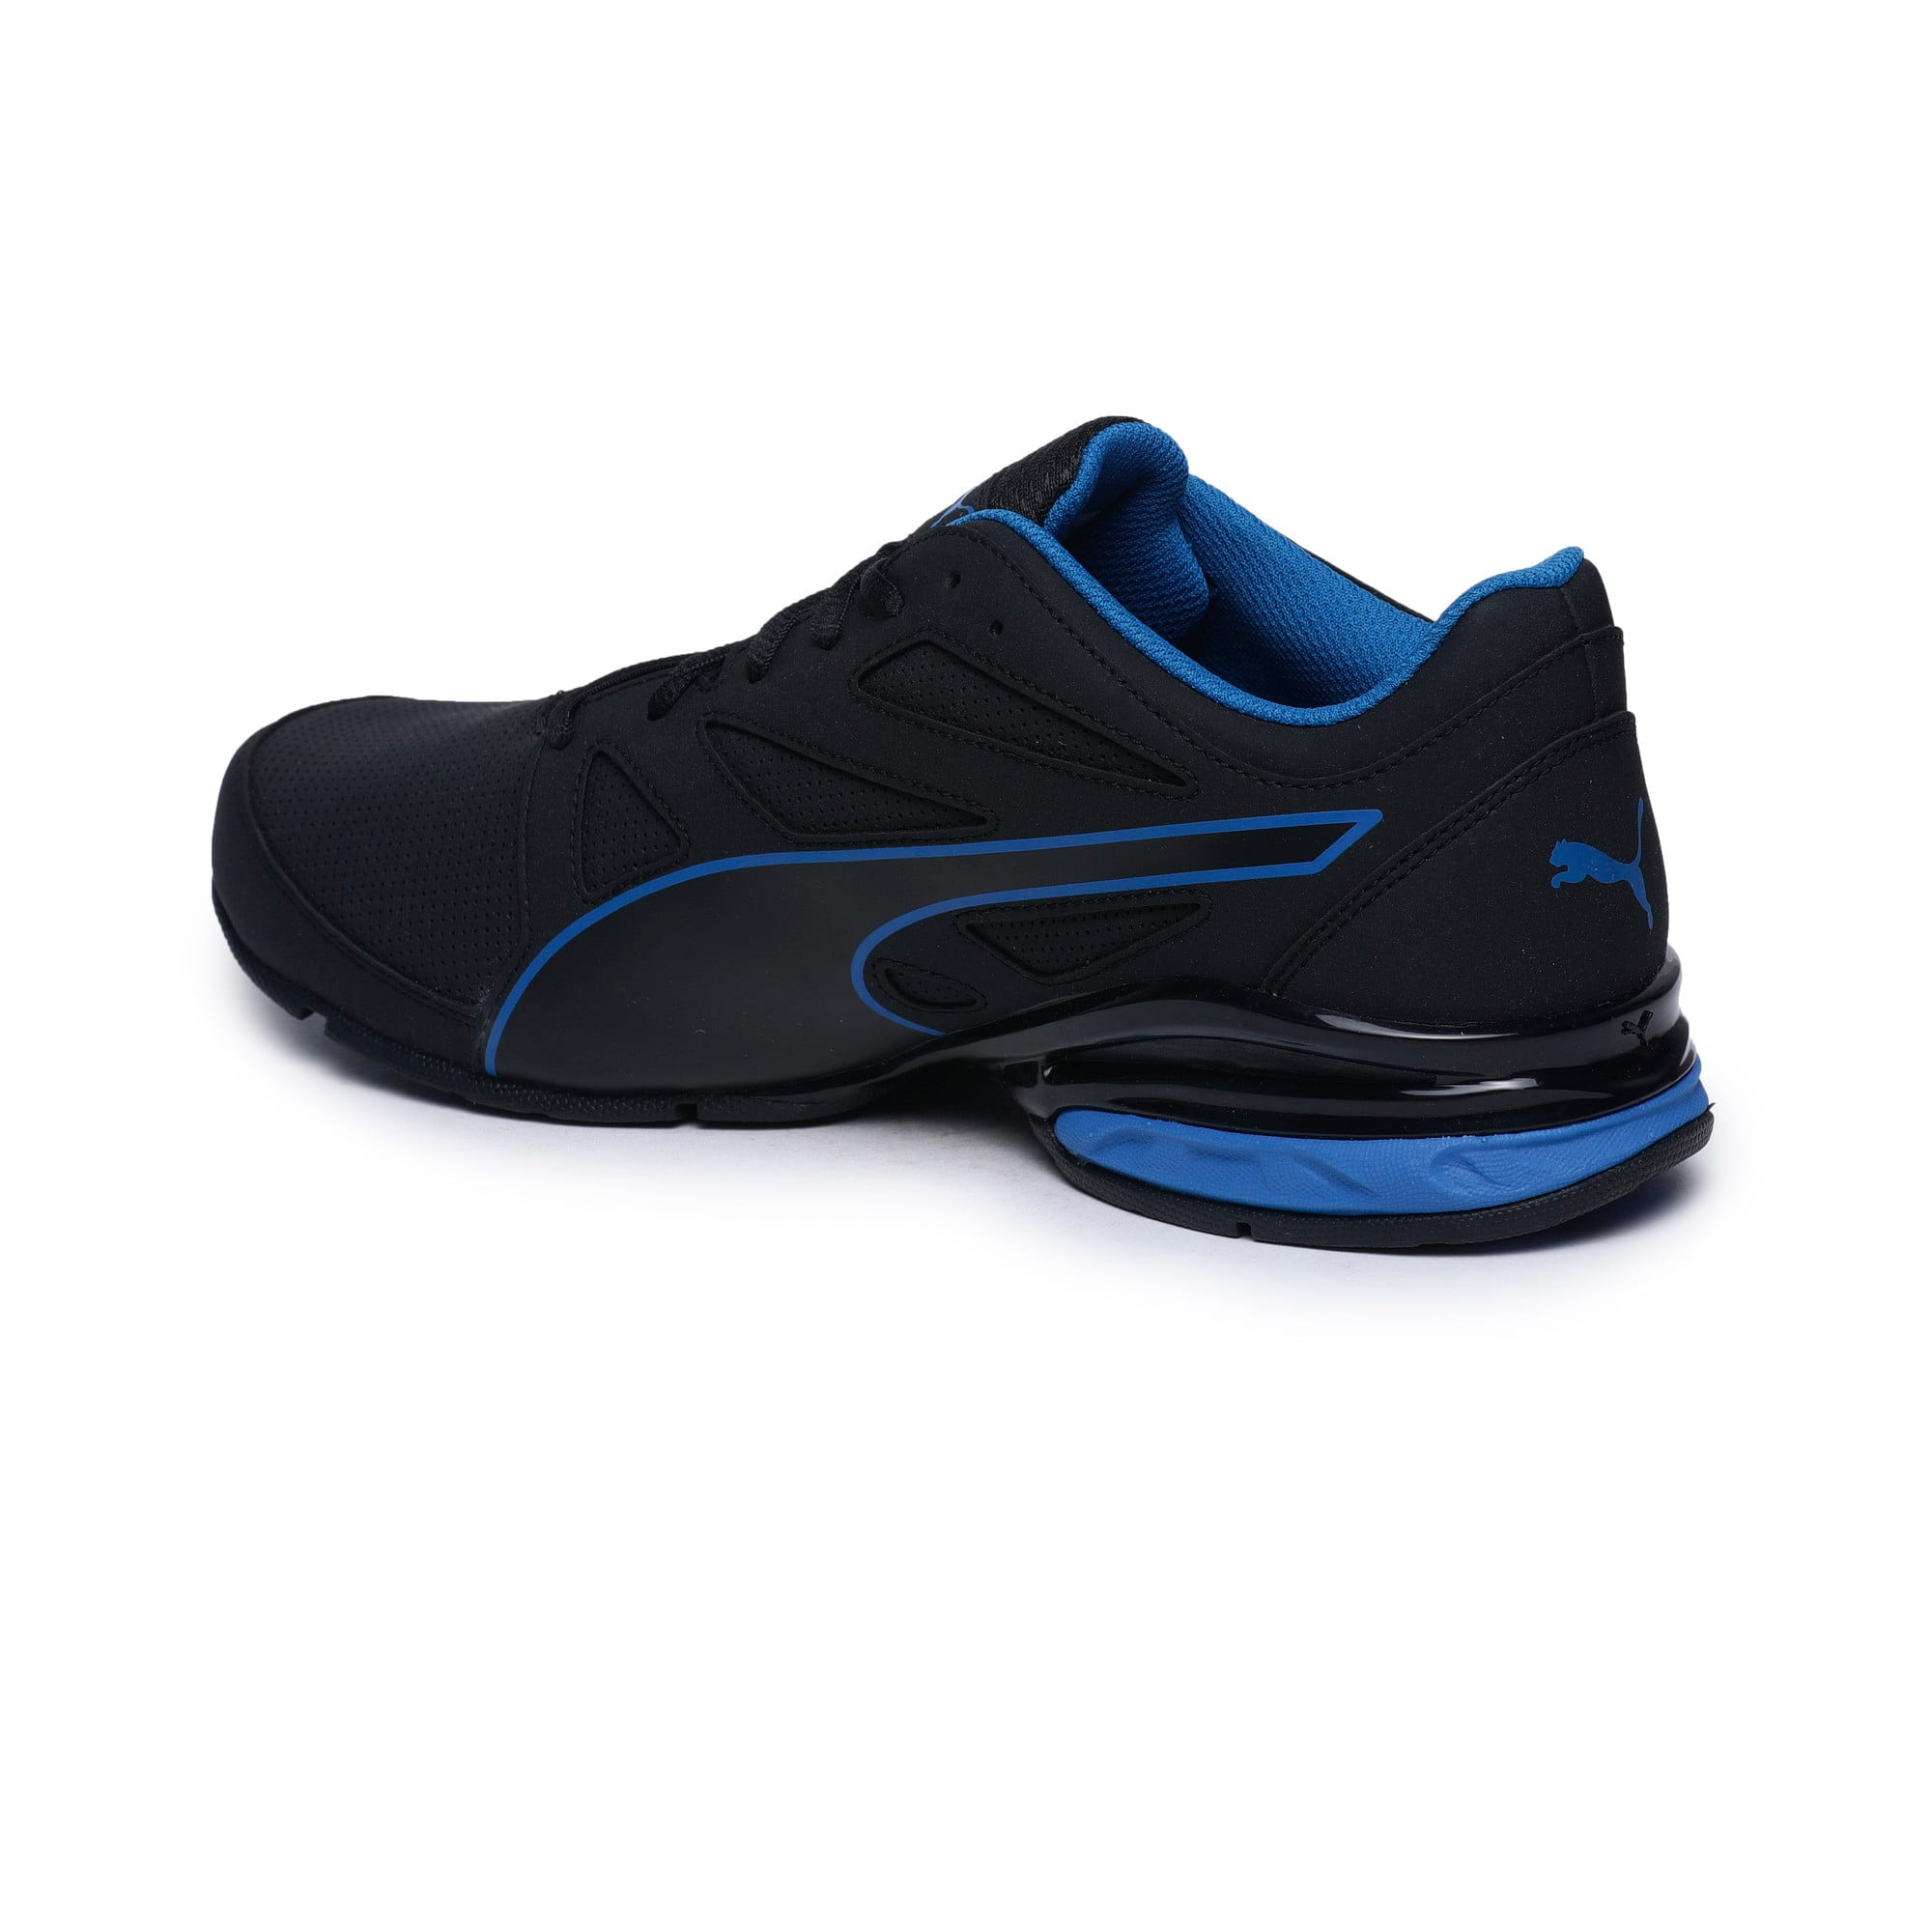 Thumbnail 6 of Tazon Modern SL Men's Running Shoes, Puma Black-Lapis Blue, medium-IND